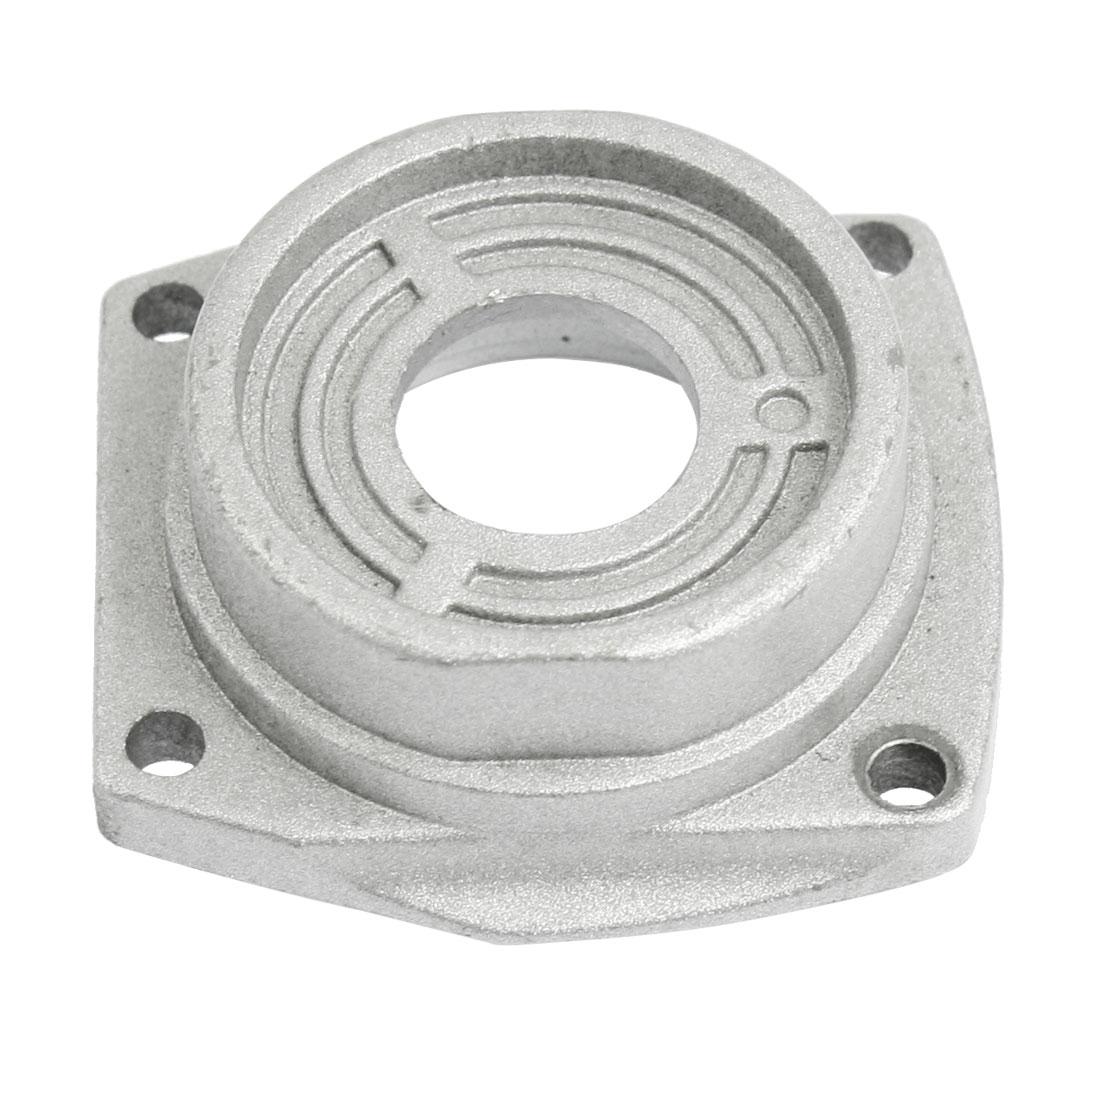 Silver Tone Aluminum Angle Grinder Bearing Pedestal for Hitachi 100 TGC-100SA